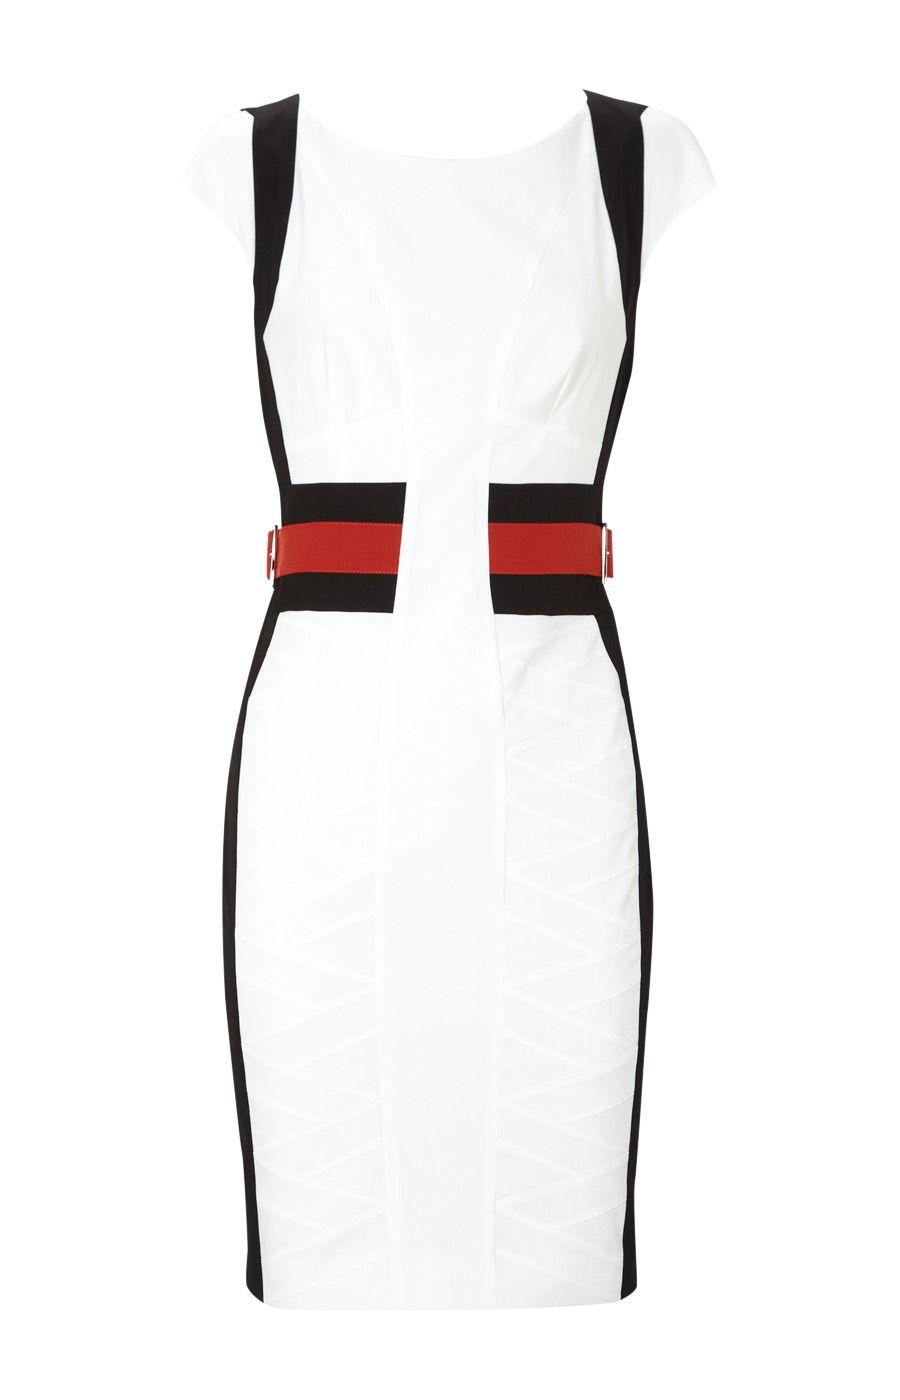 Karen Millen Sporty Colourblock Dress White and Black [#KMM094] - $80.71 :